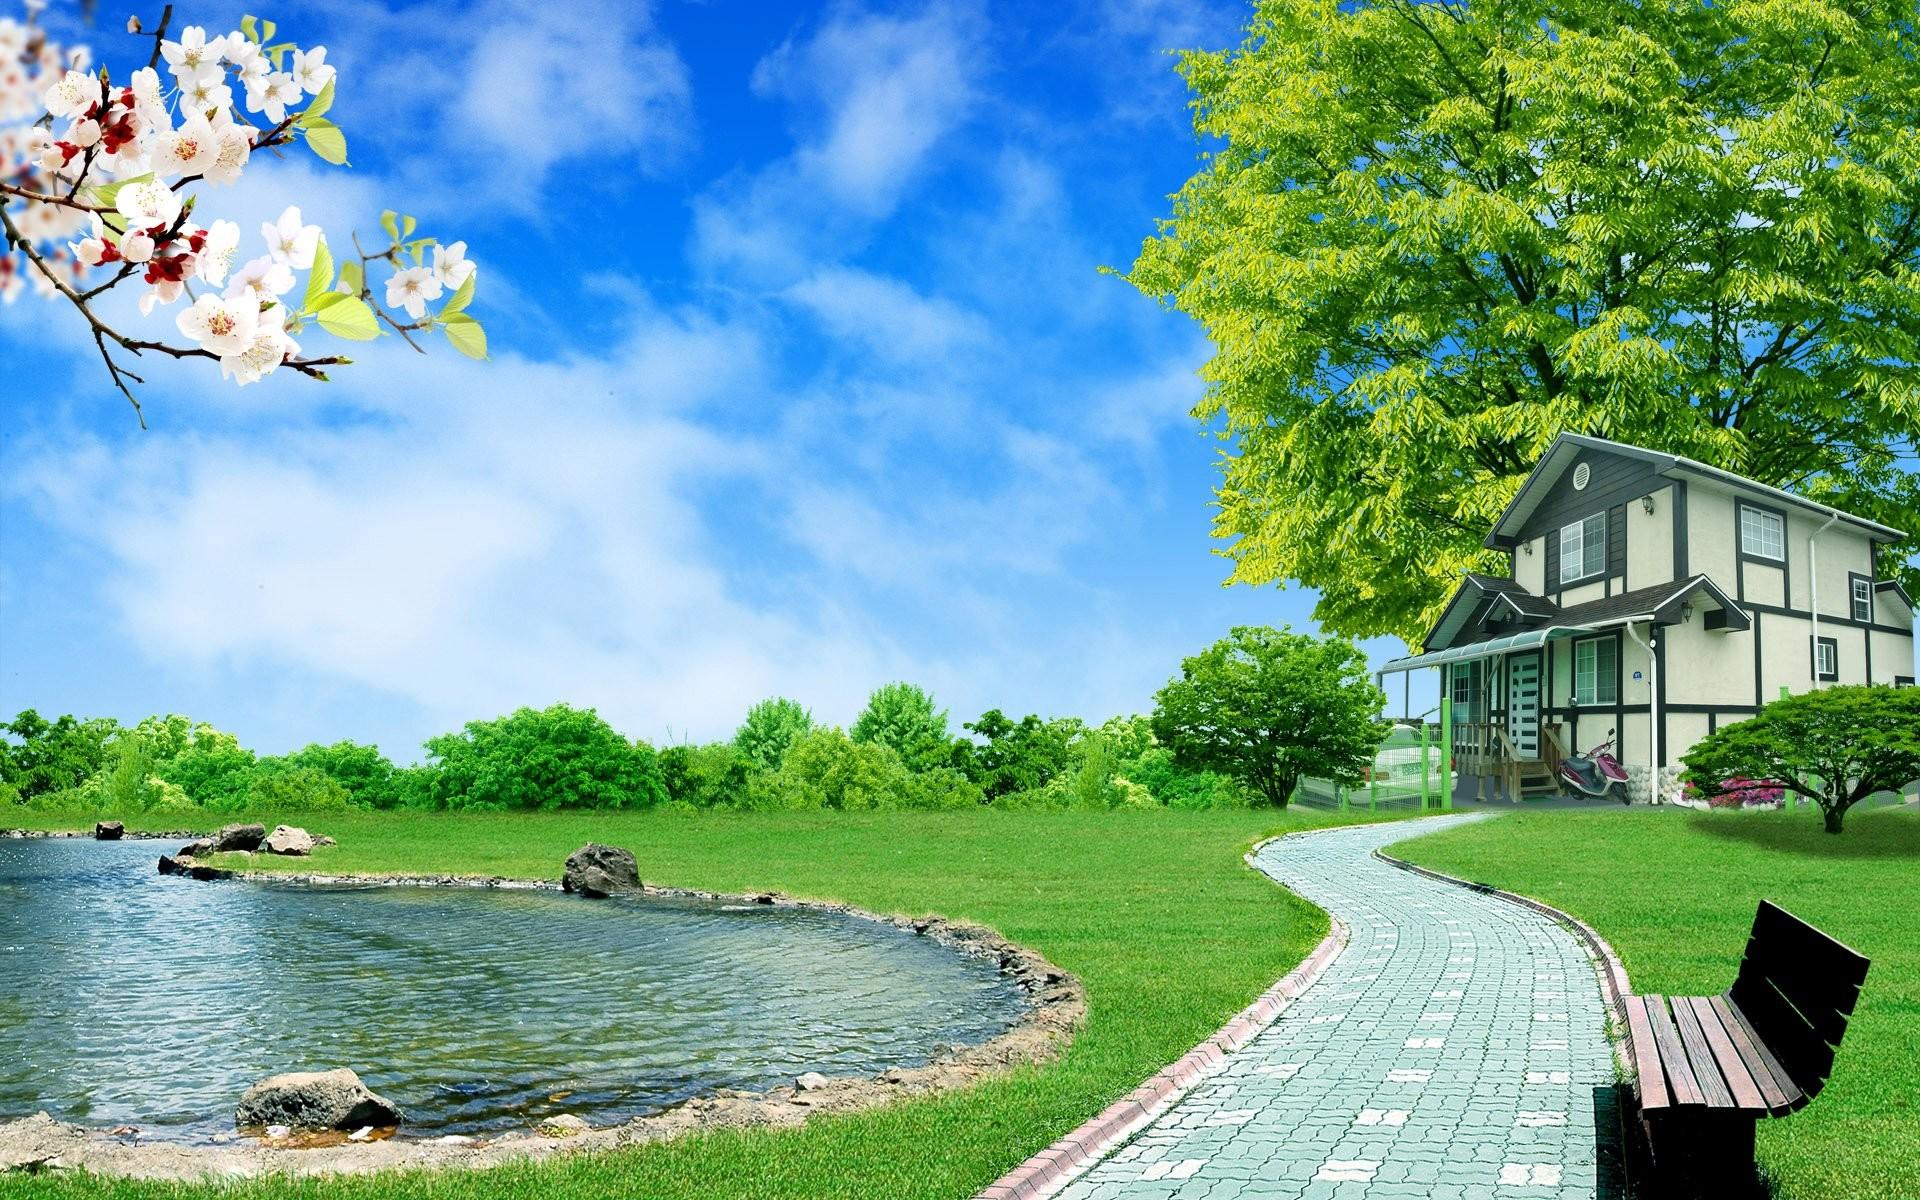 3d Nature Wallpapers Hd For Desktop Wallpaper Images